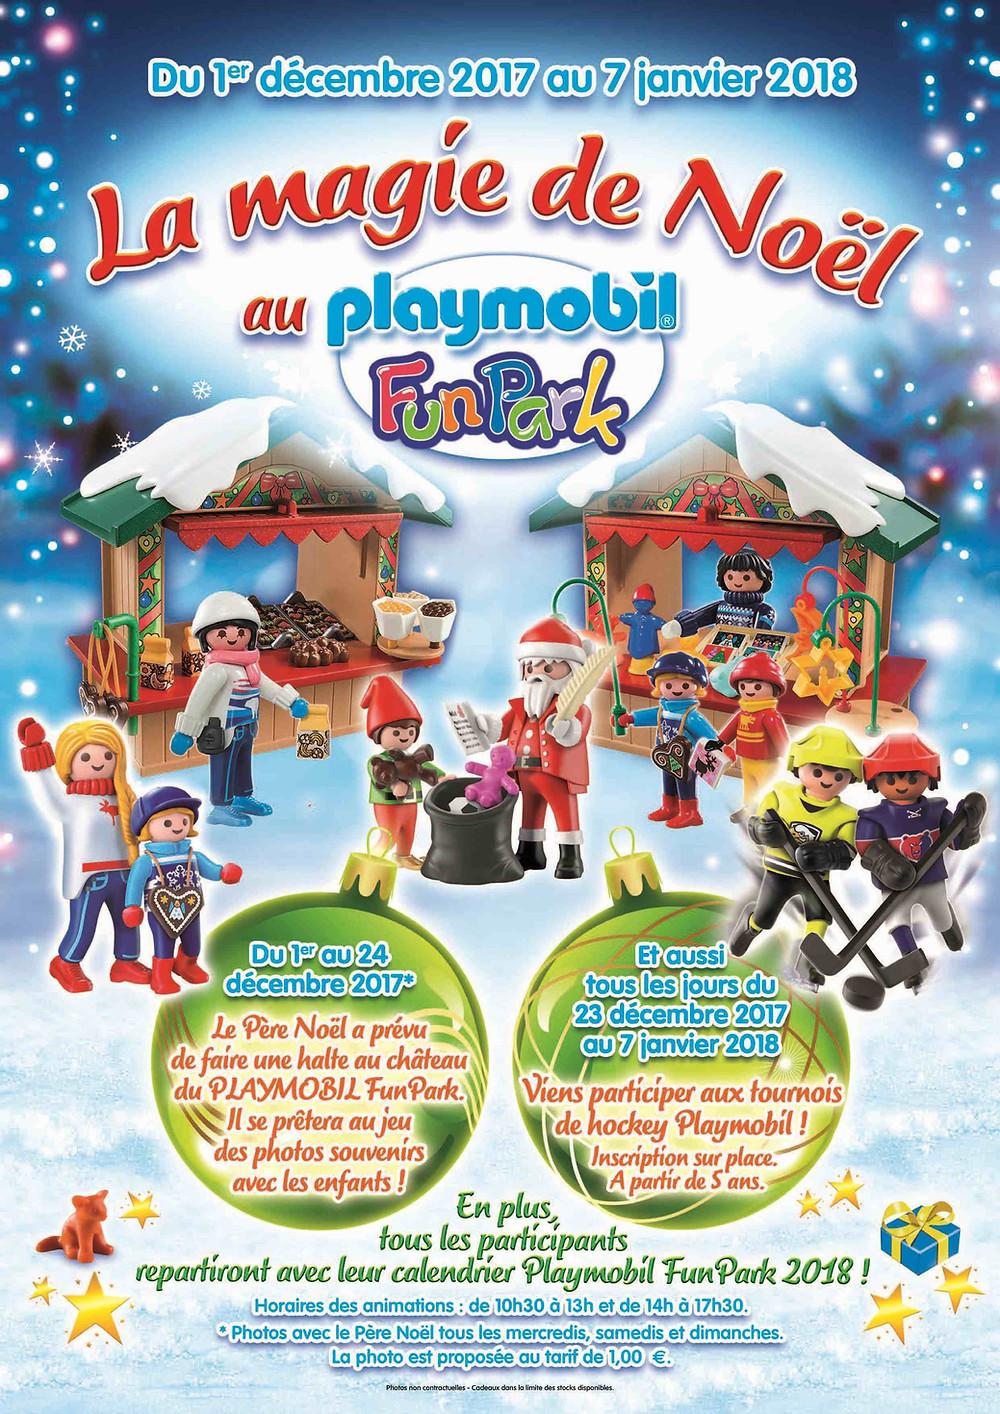 Noël au PLAYMOBIL FunPark